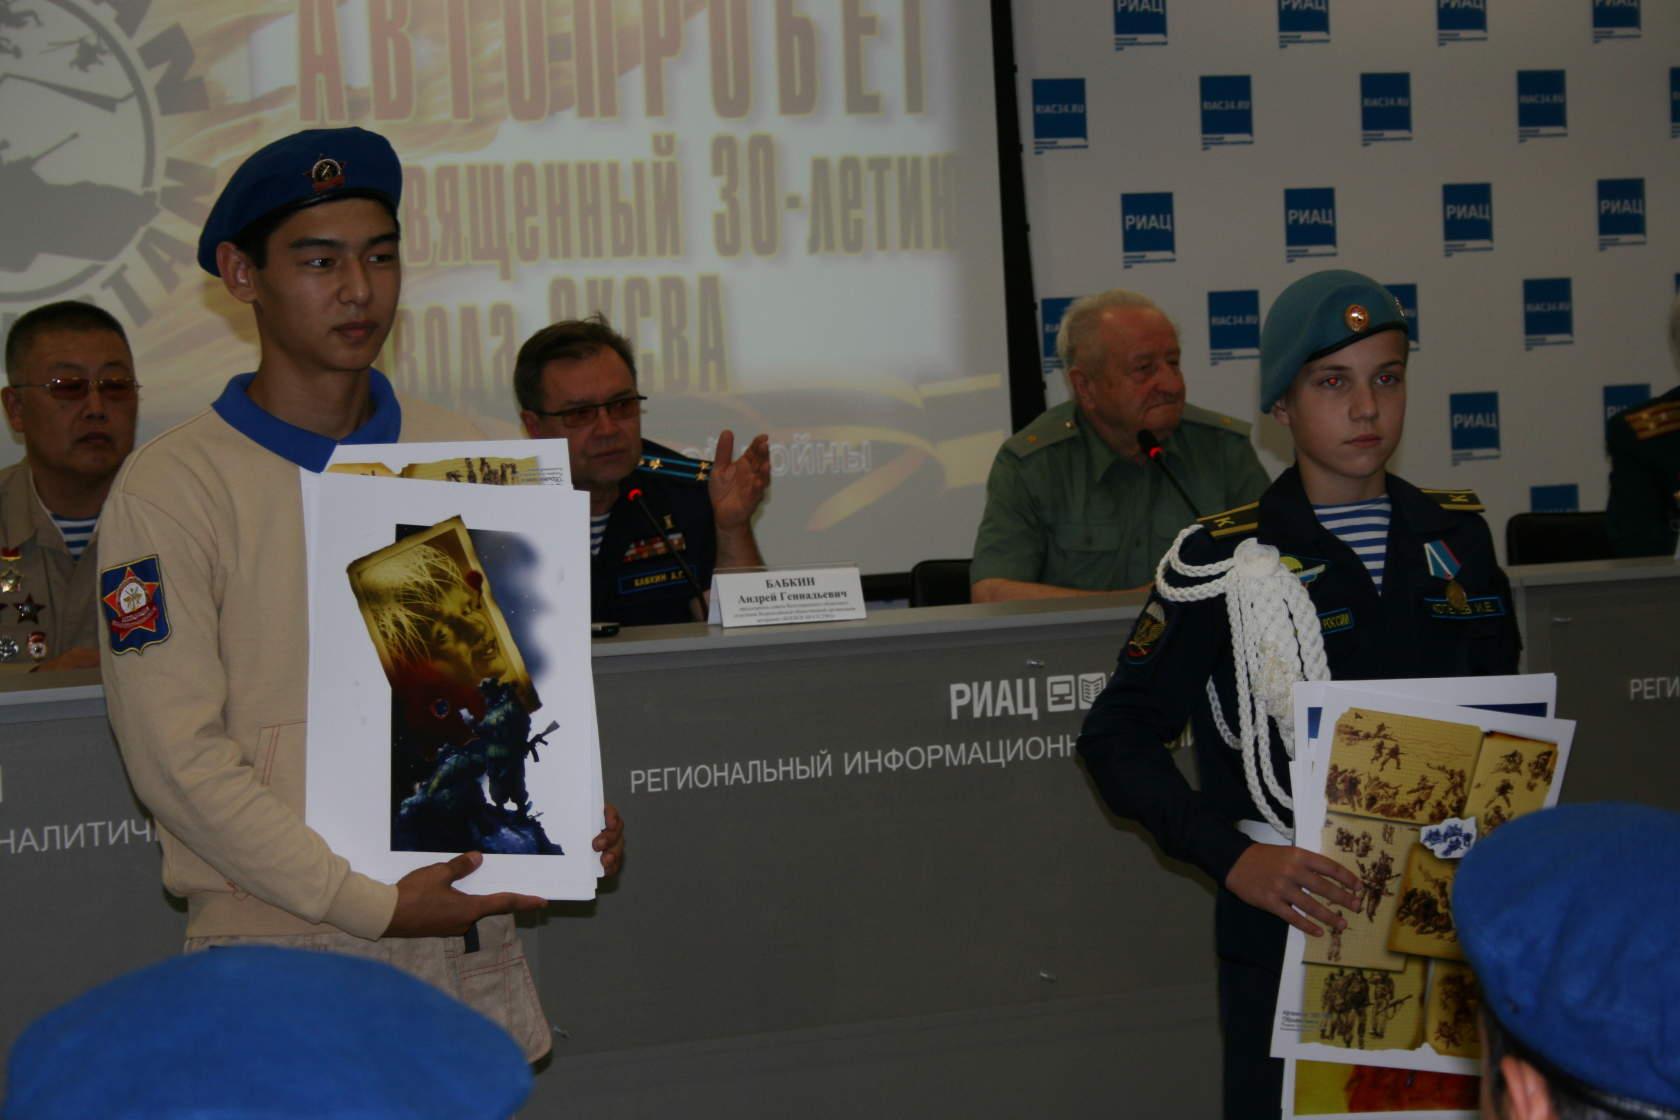 Передачи выставки кадетам Волгограда